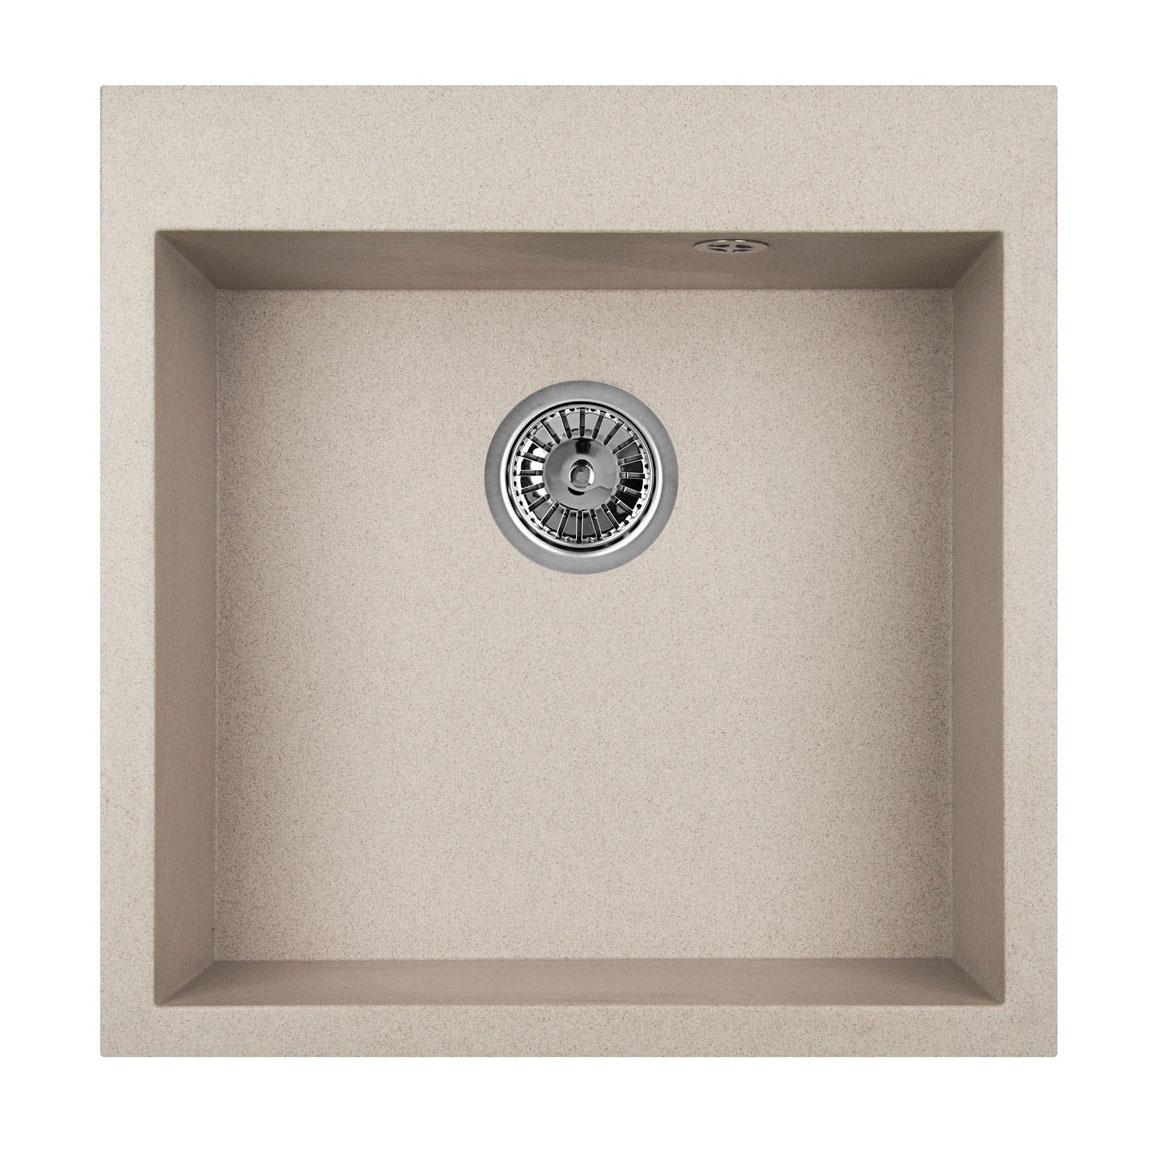 Кухонная мойка Granula GR-5102 505х510 антик цена